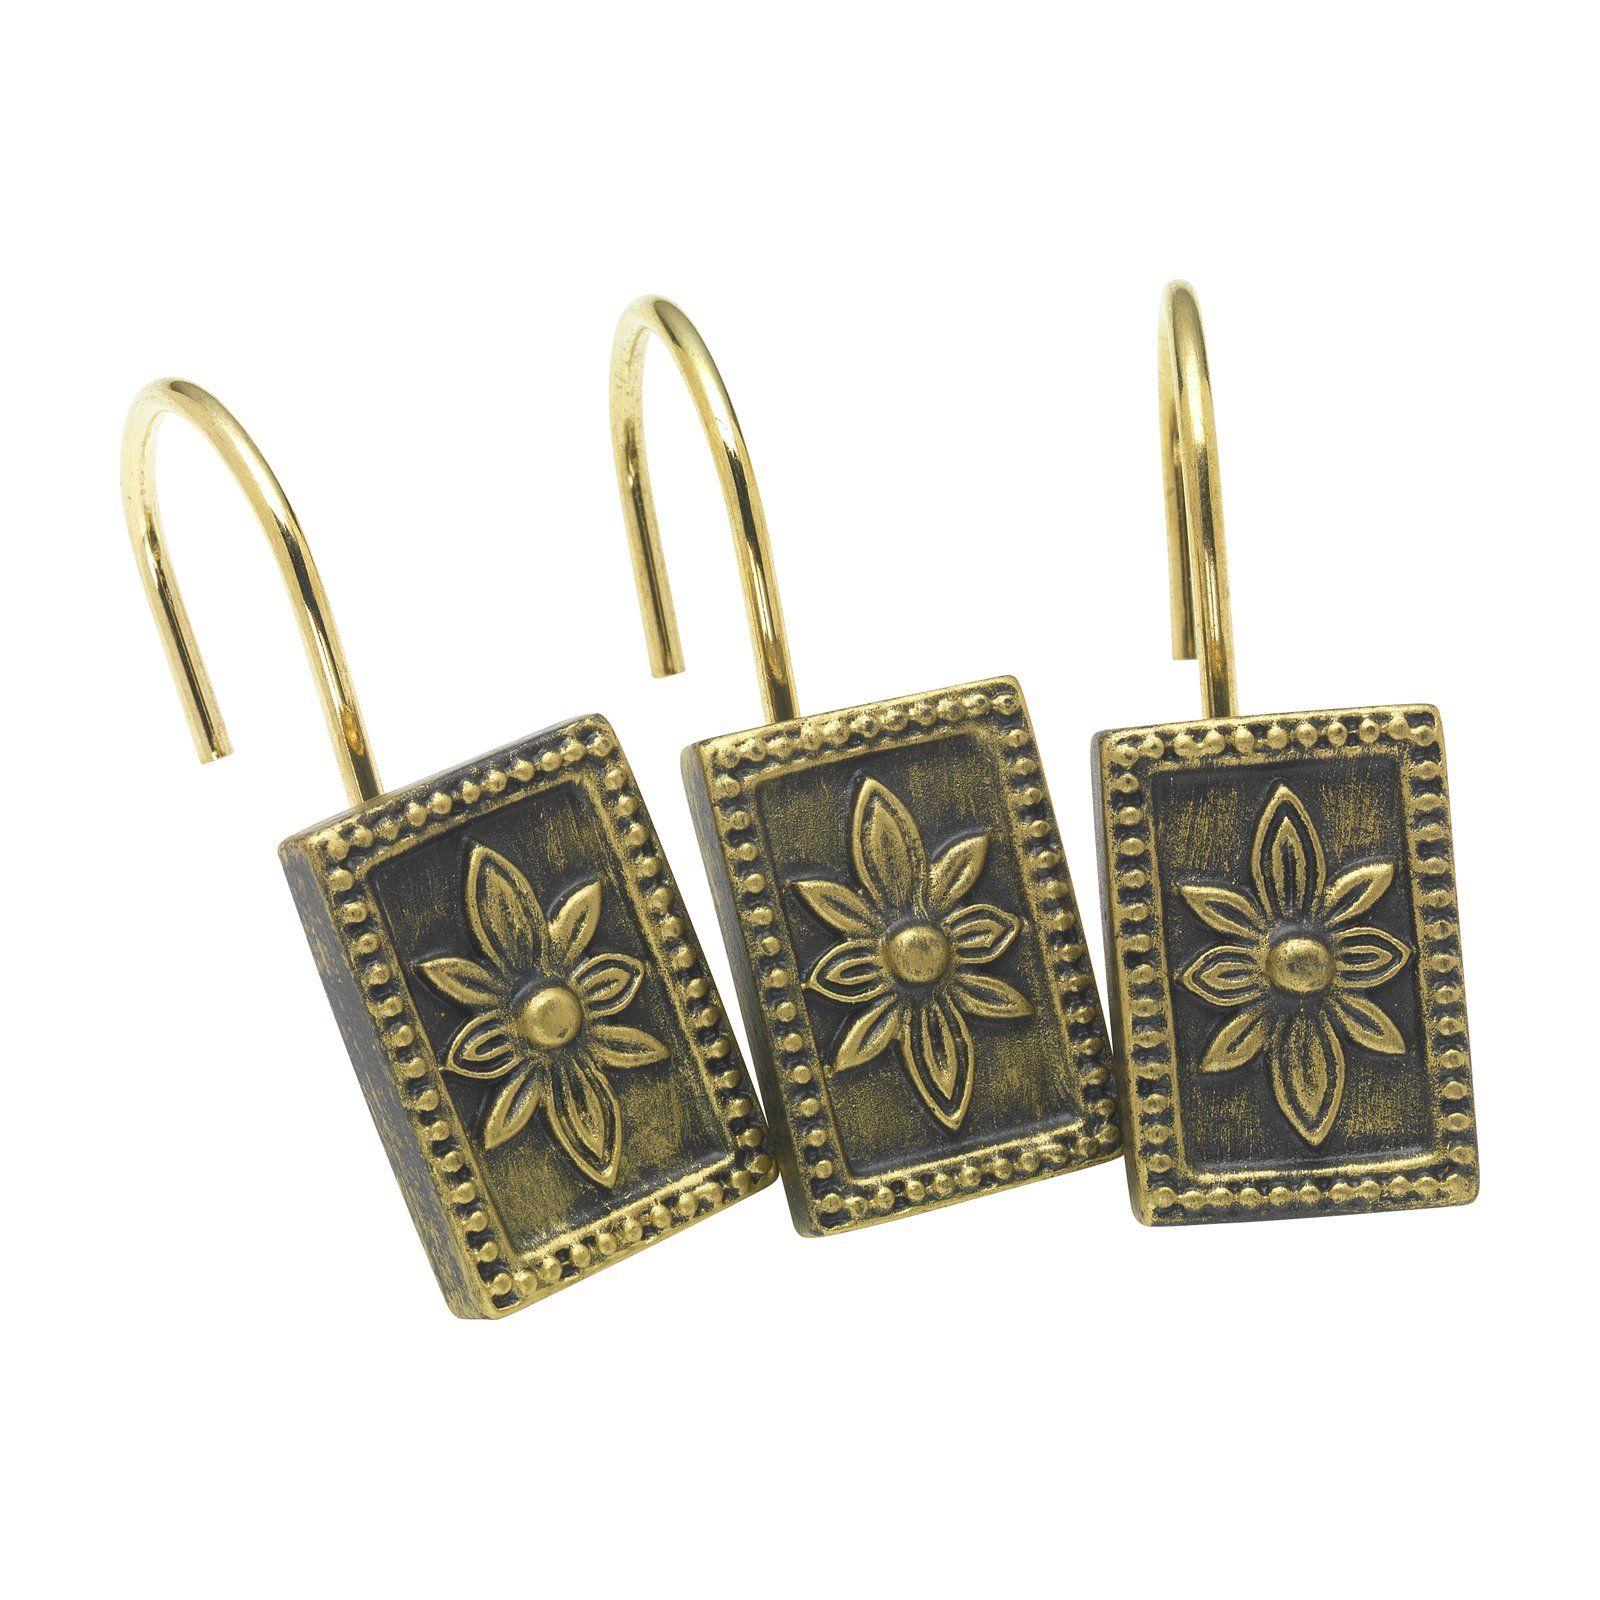 Carnation Home Fashions Carlisle Shower Curtain Hooks Antique Gold